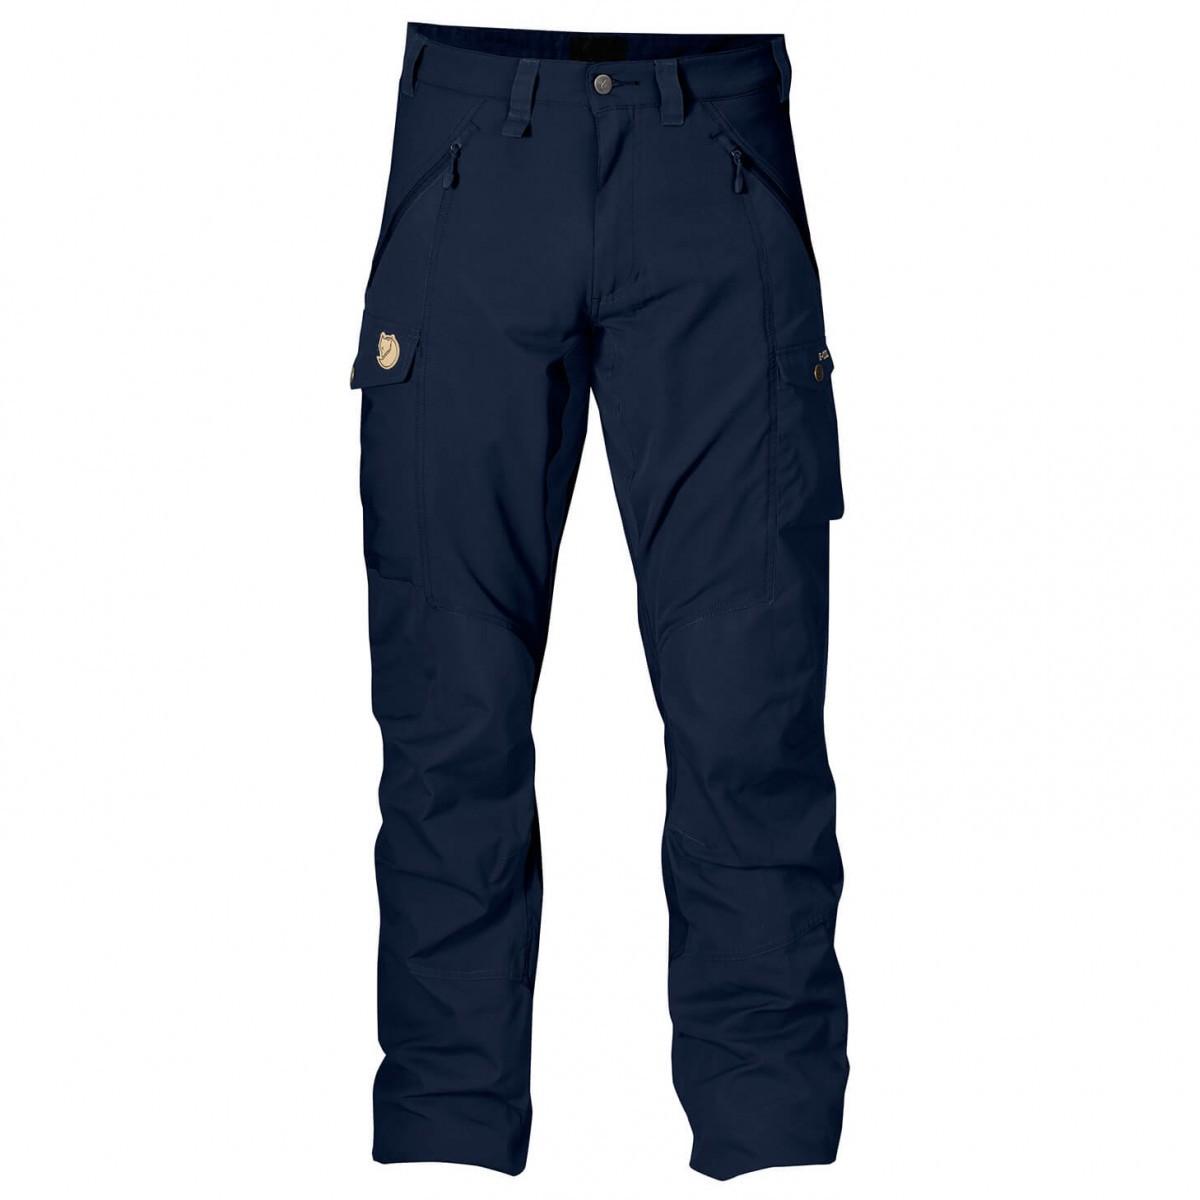 FJALLRAVEN フェールラーベン Abisko Trousers パンツ (Dark Navy)